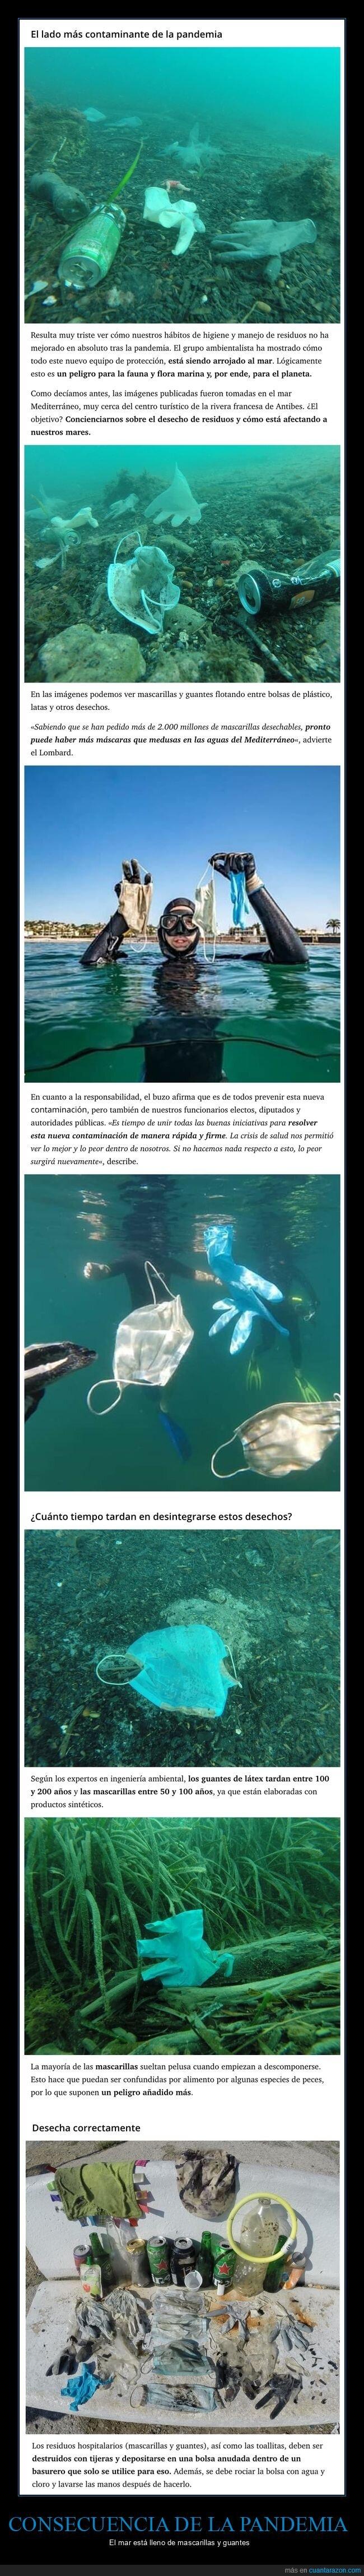 consecuencia,contaminación,coronavirus,guantes,mar,mascarillas,pandemia